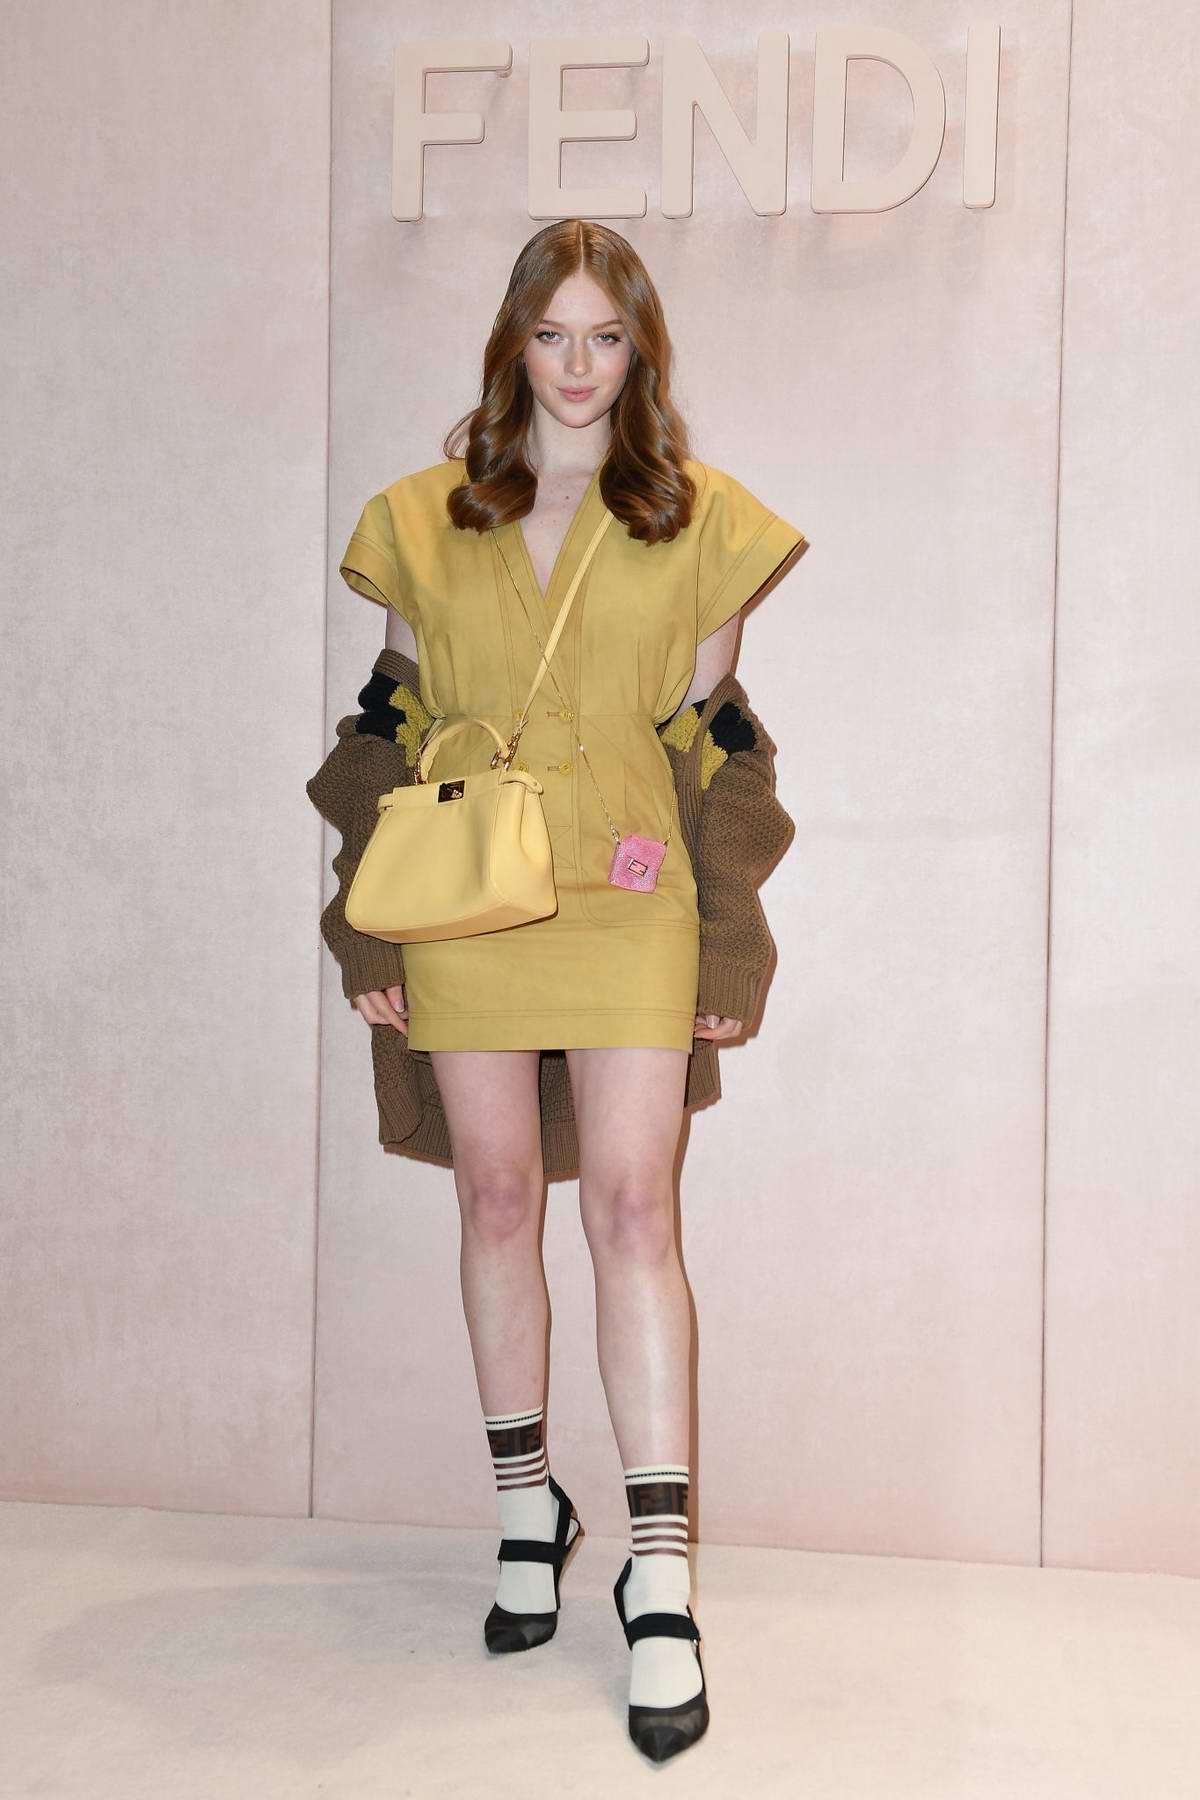 Larsen Thompson attends the Fendi fashion show, F/W 2020 during Milan Fashion Week in Milan, Italy